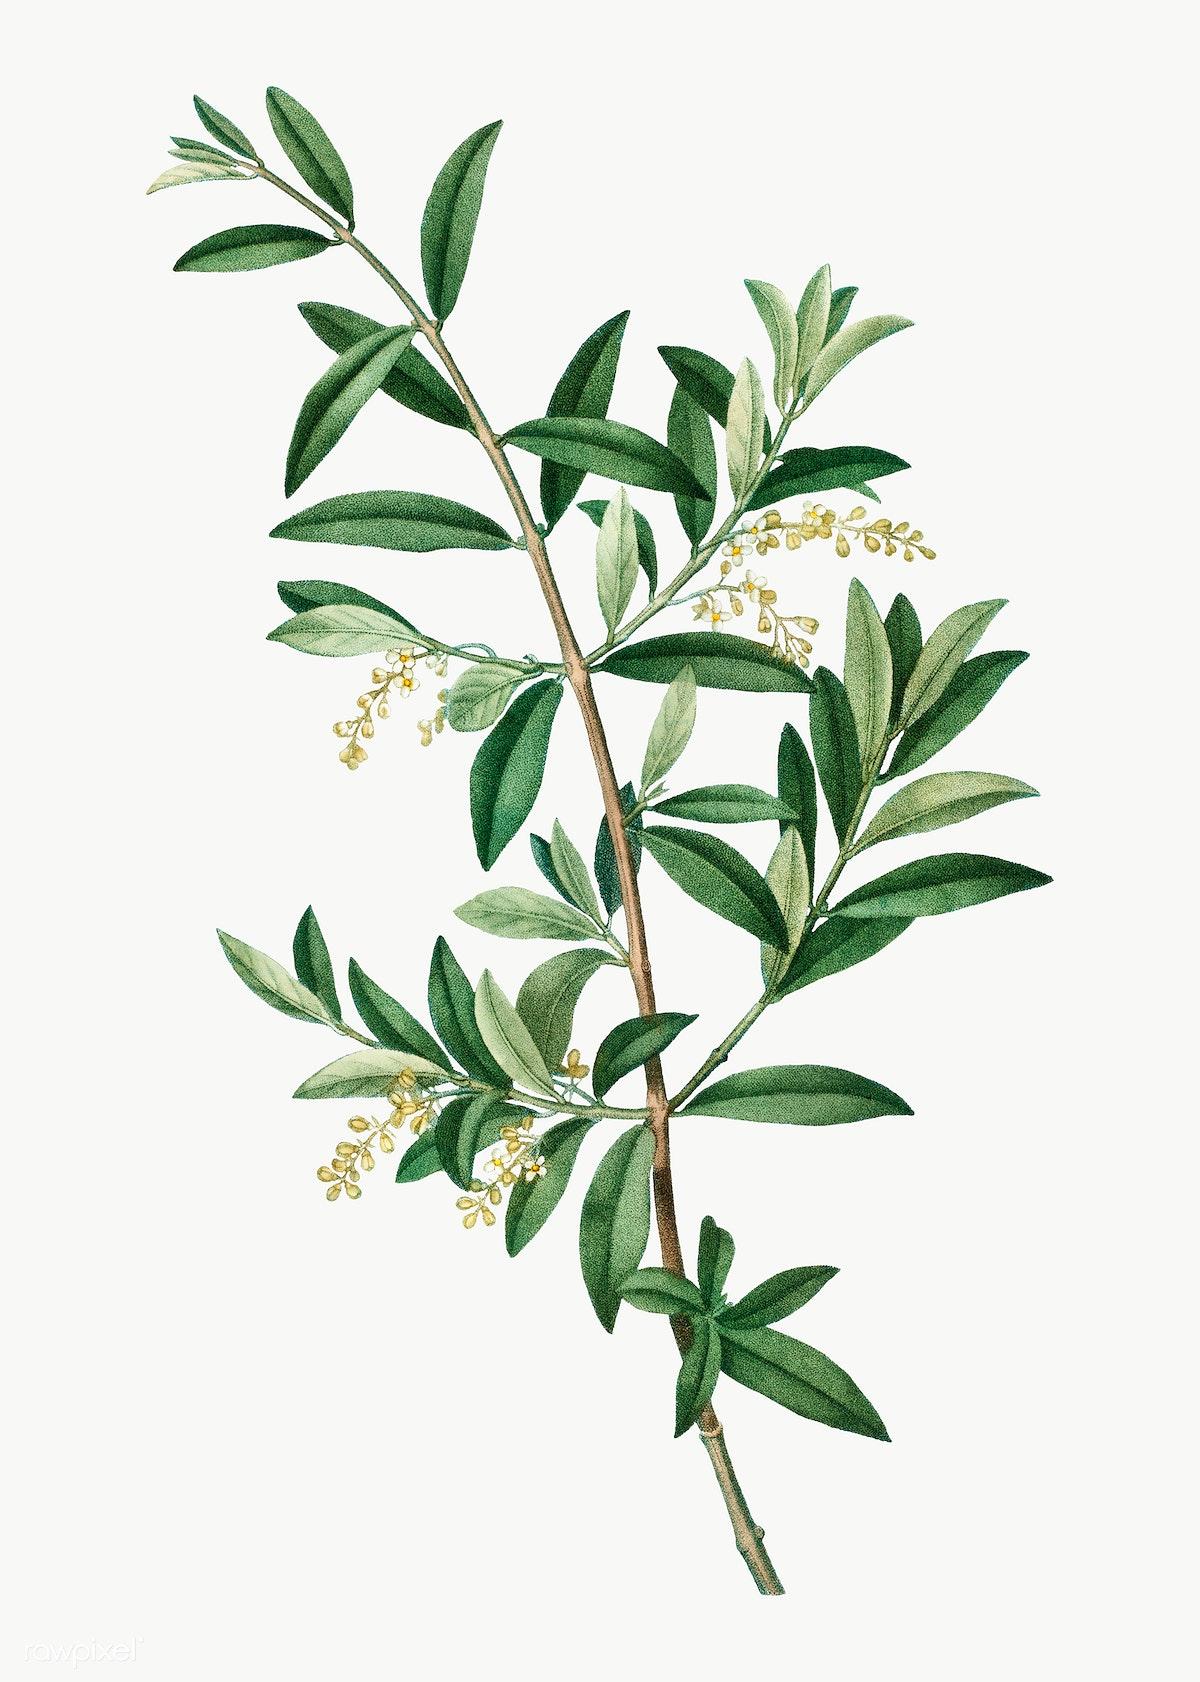 Green Olive Tree Free Stock Illustration